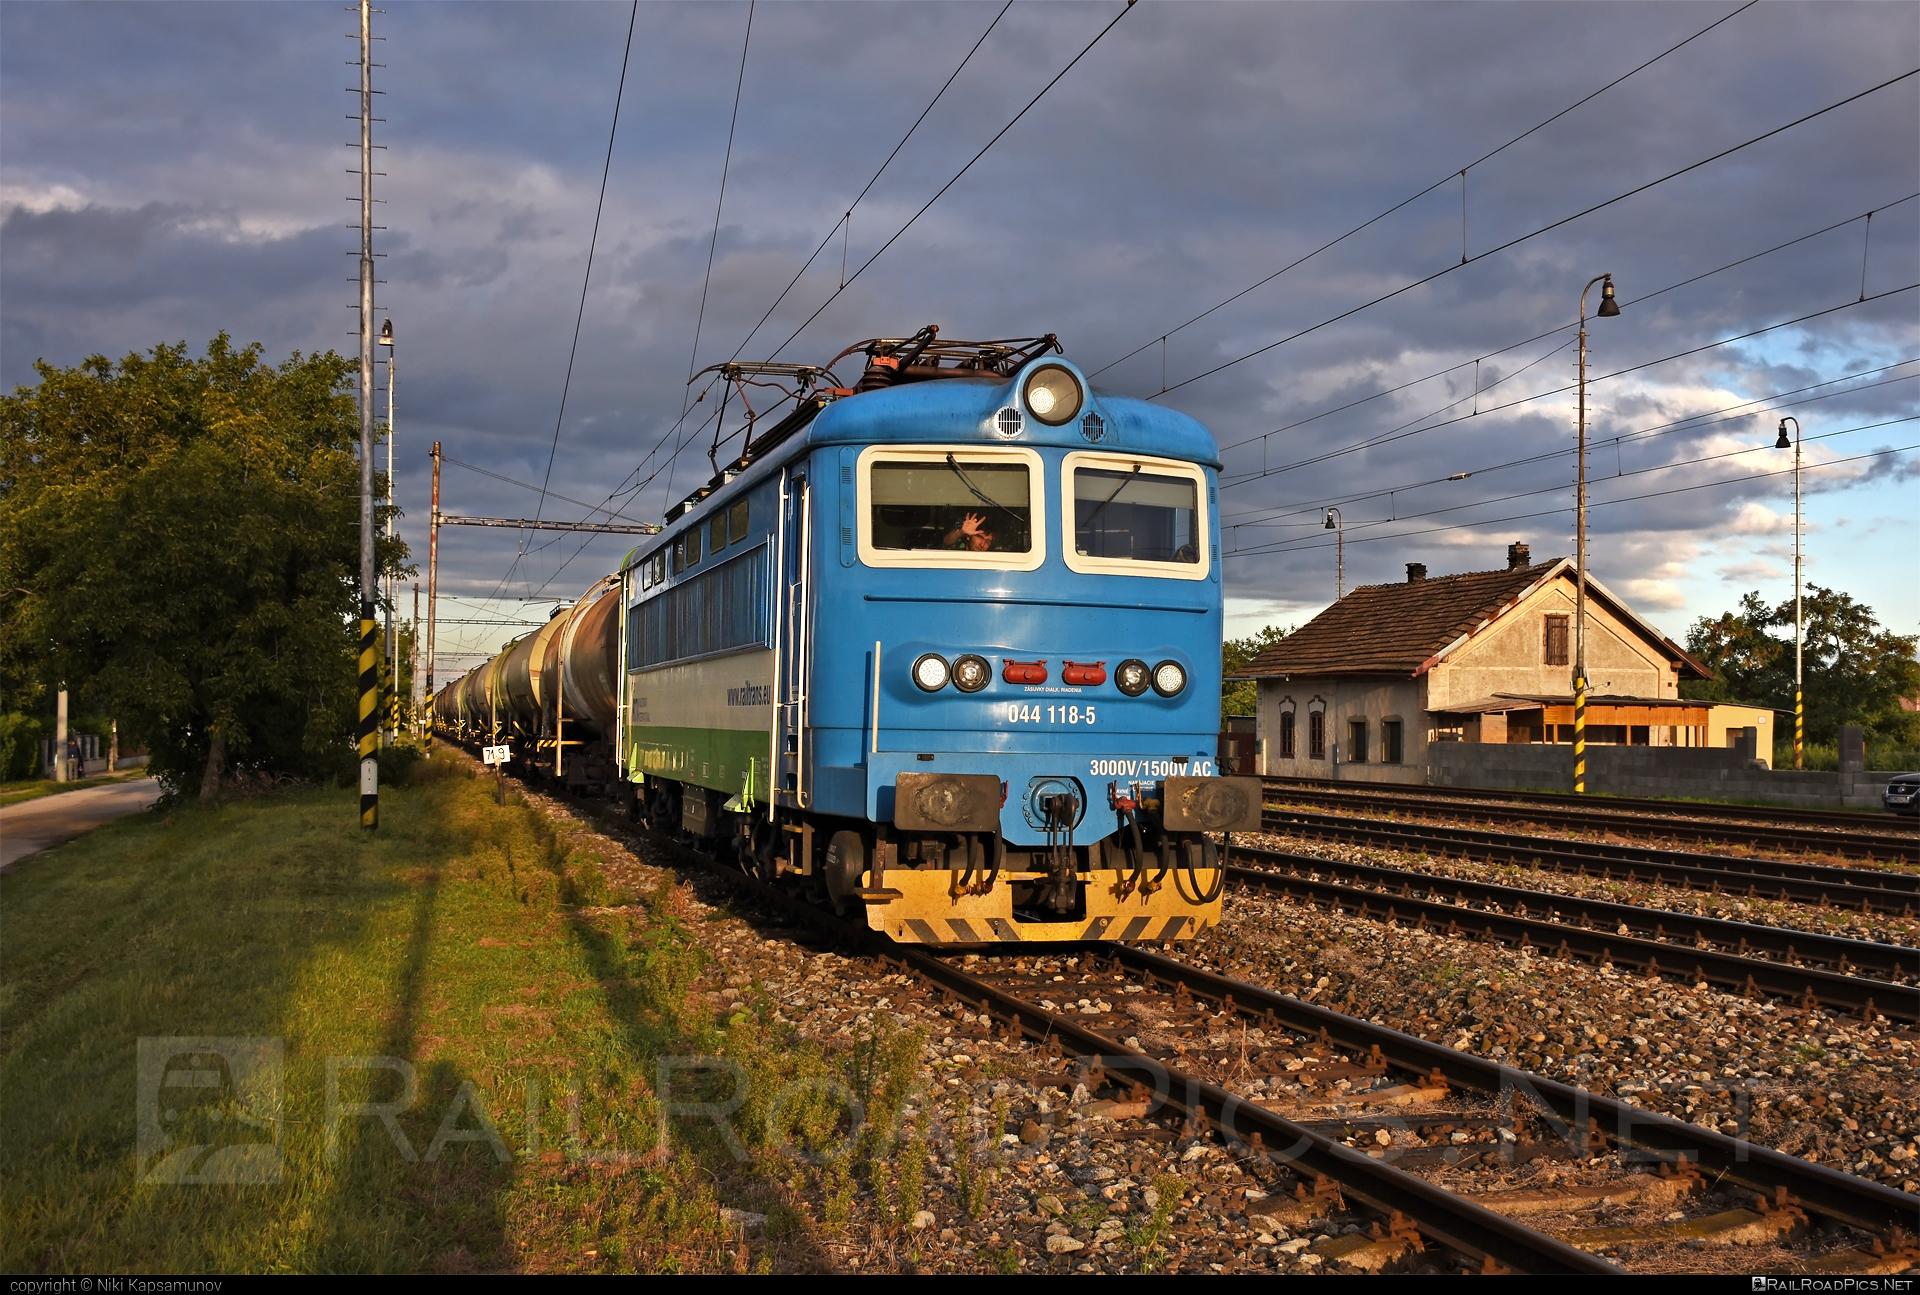 Škoda 73E - 044 118-5 operated by Railtrans International, s.r.o #RailtransInternational #locomotive242 #plechac #rti #skoda #skoda73e